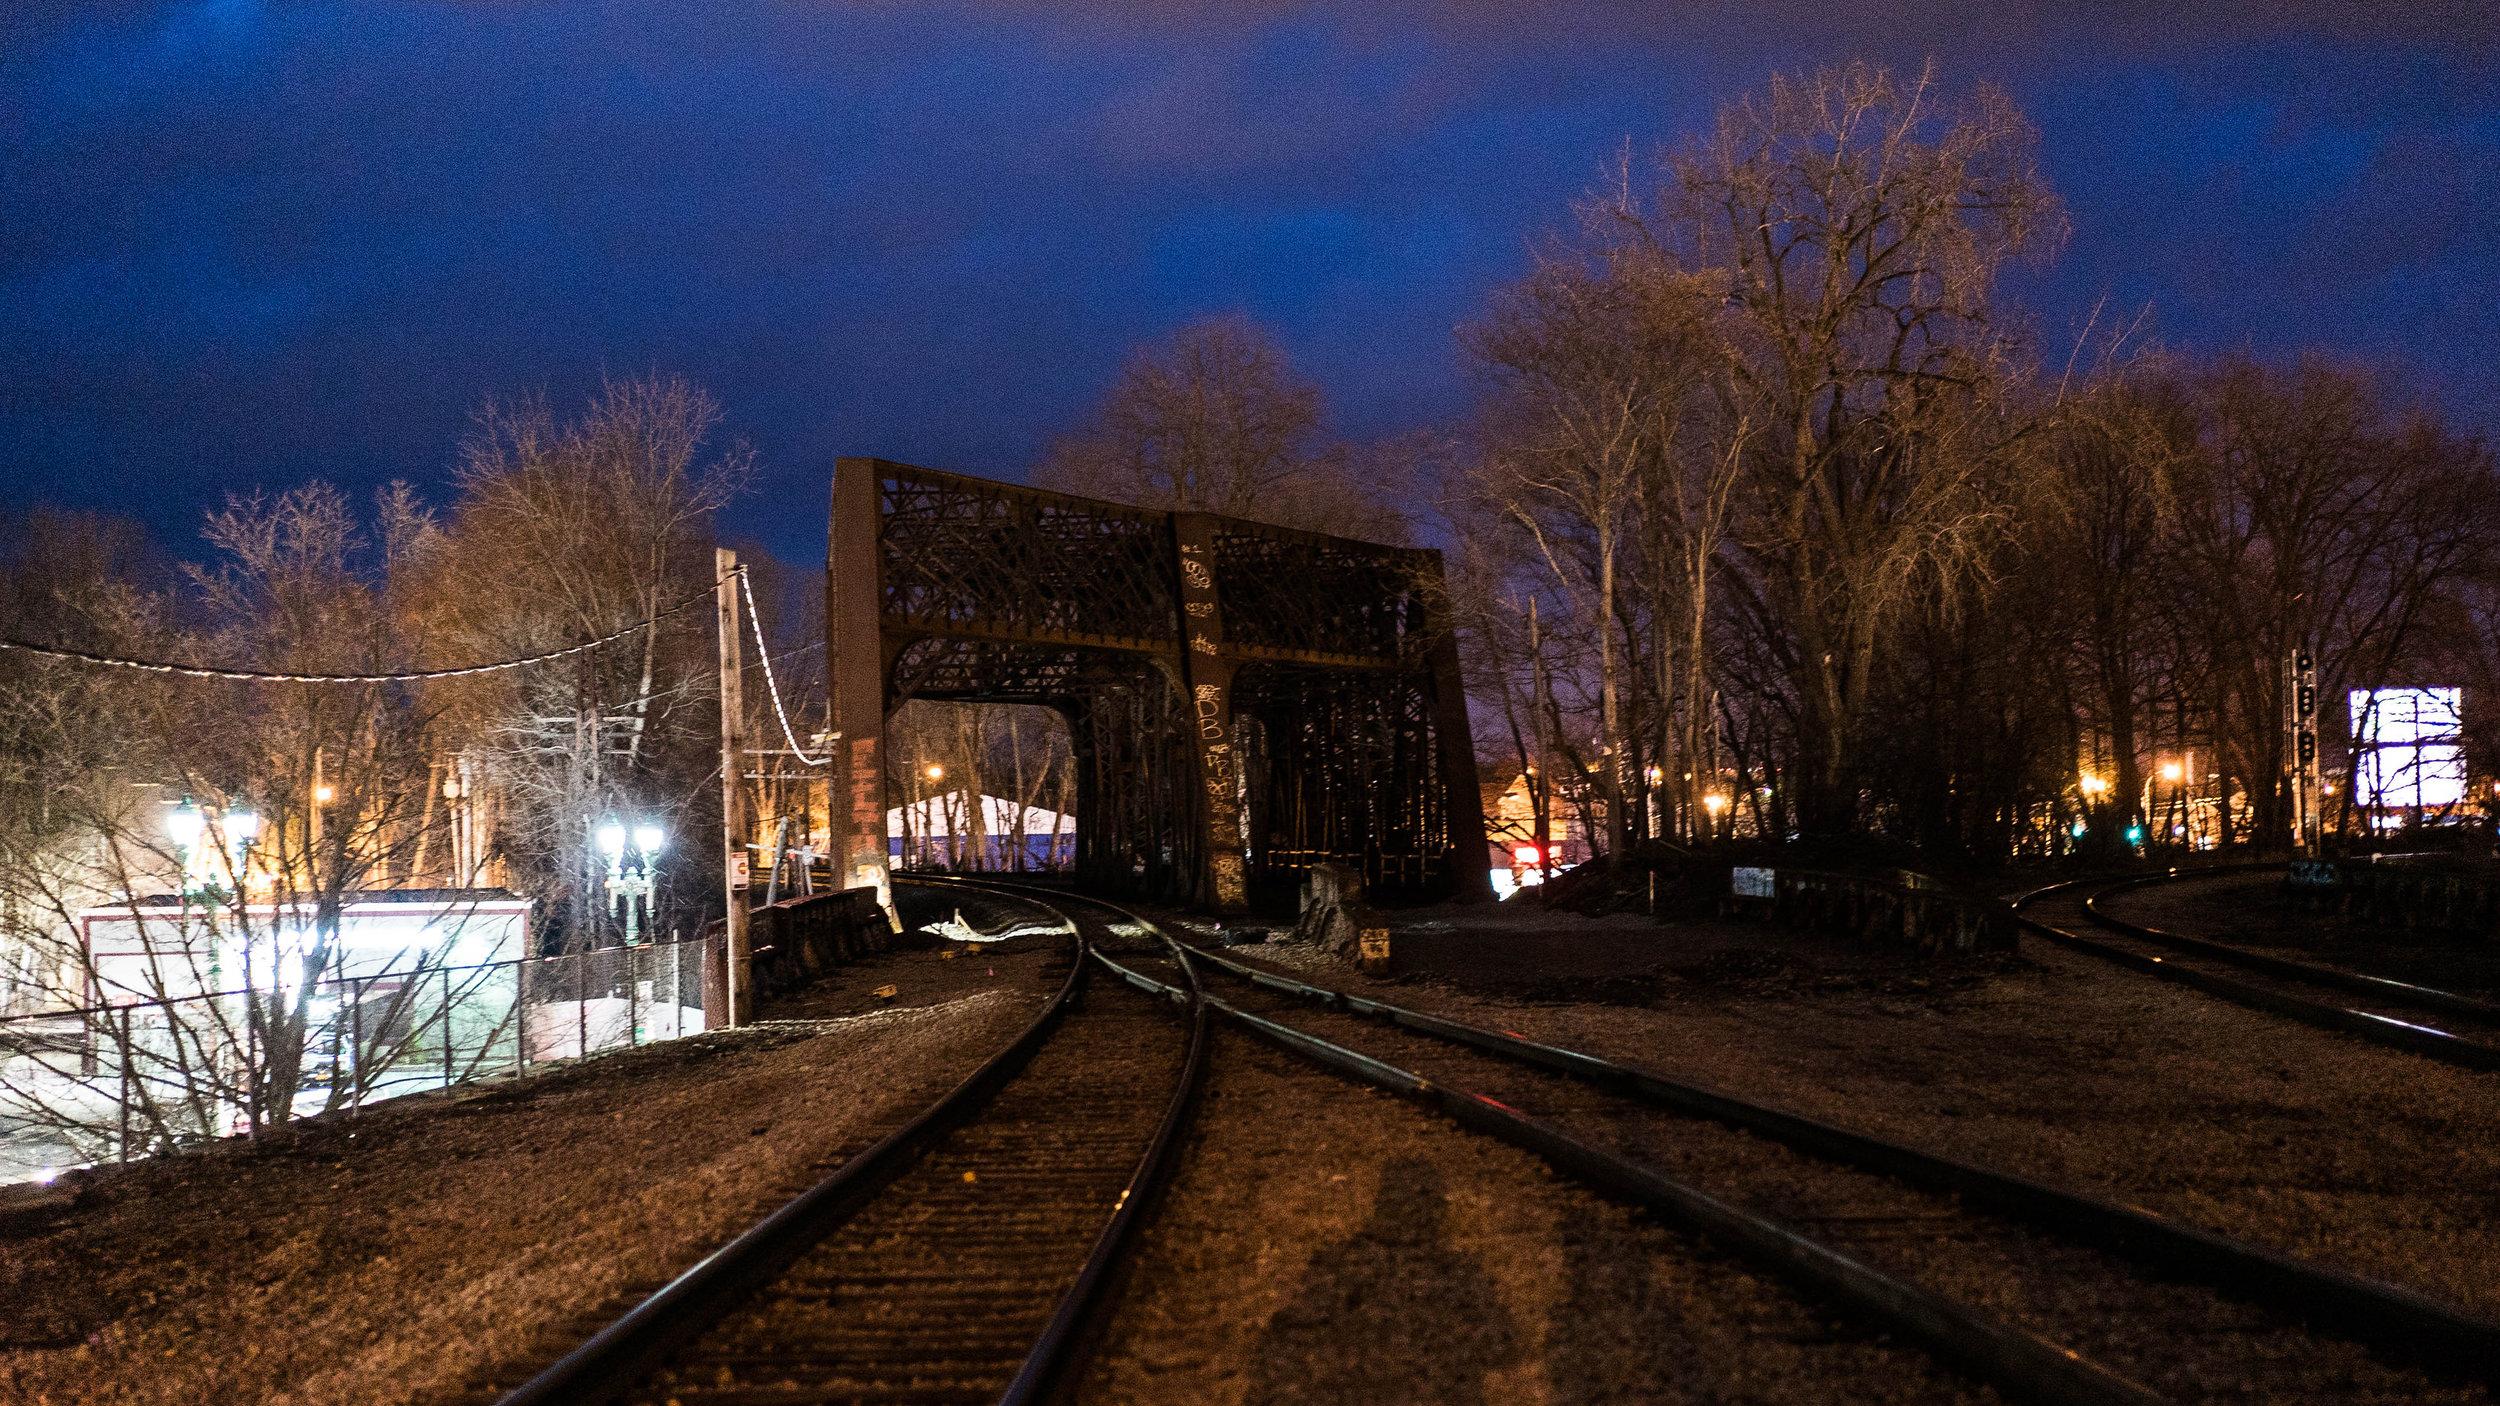 Railbridge-16.jpg